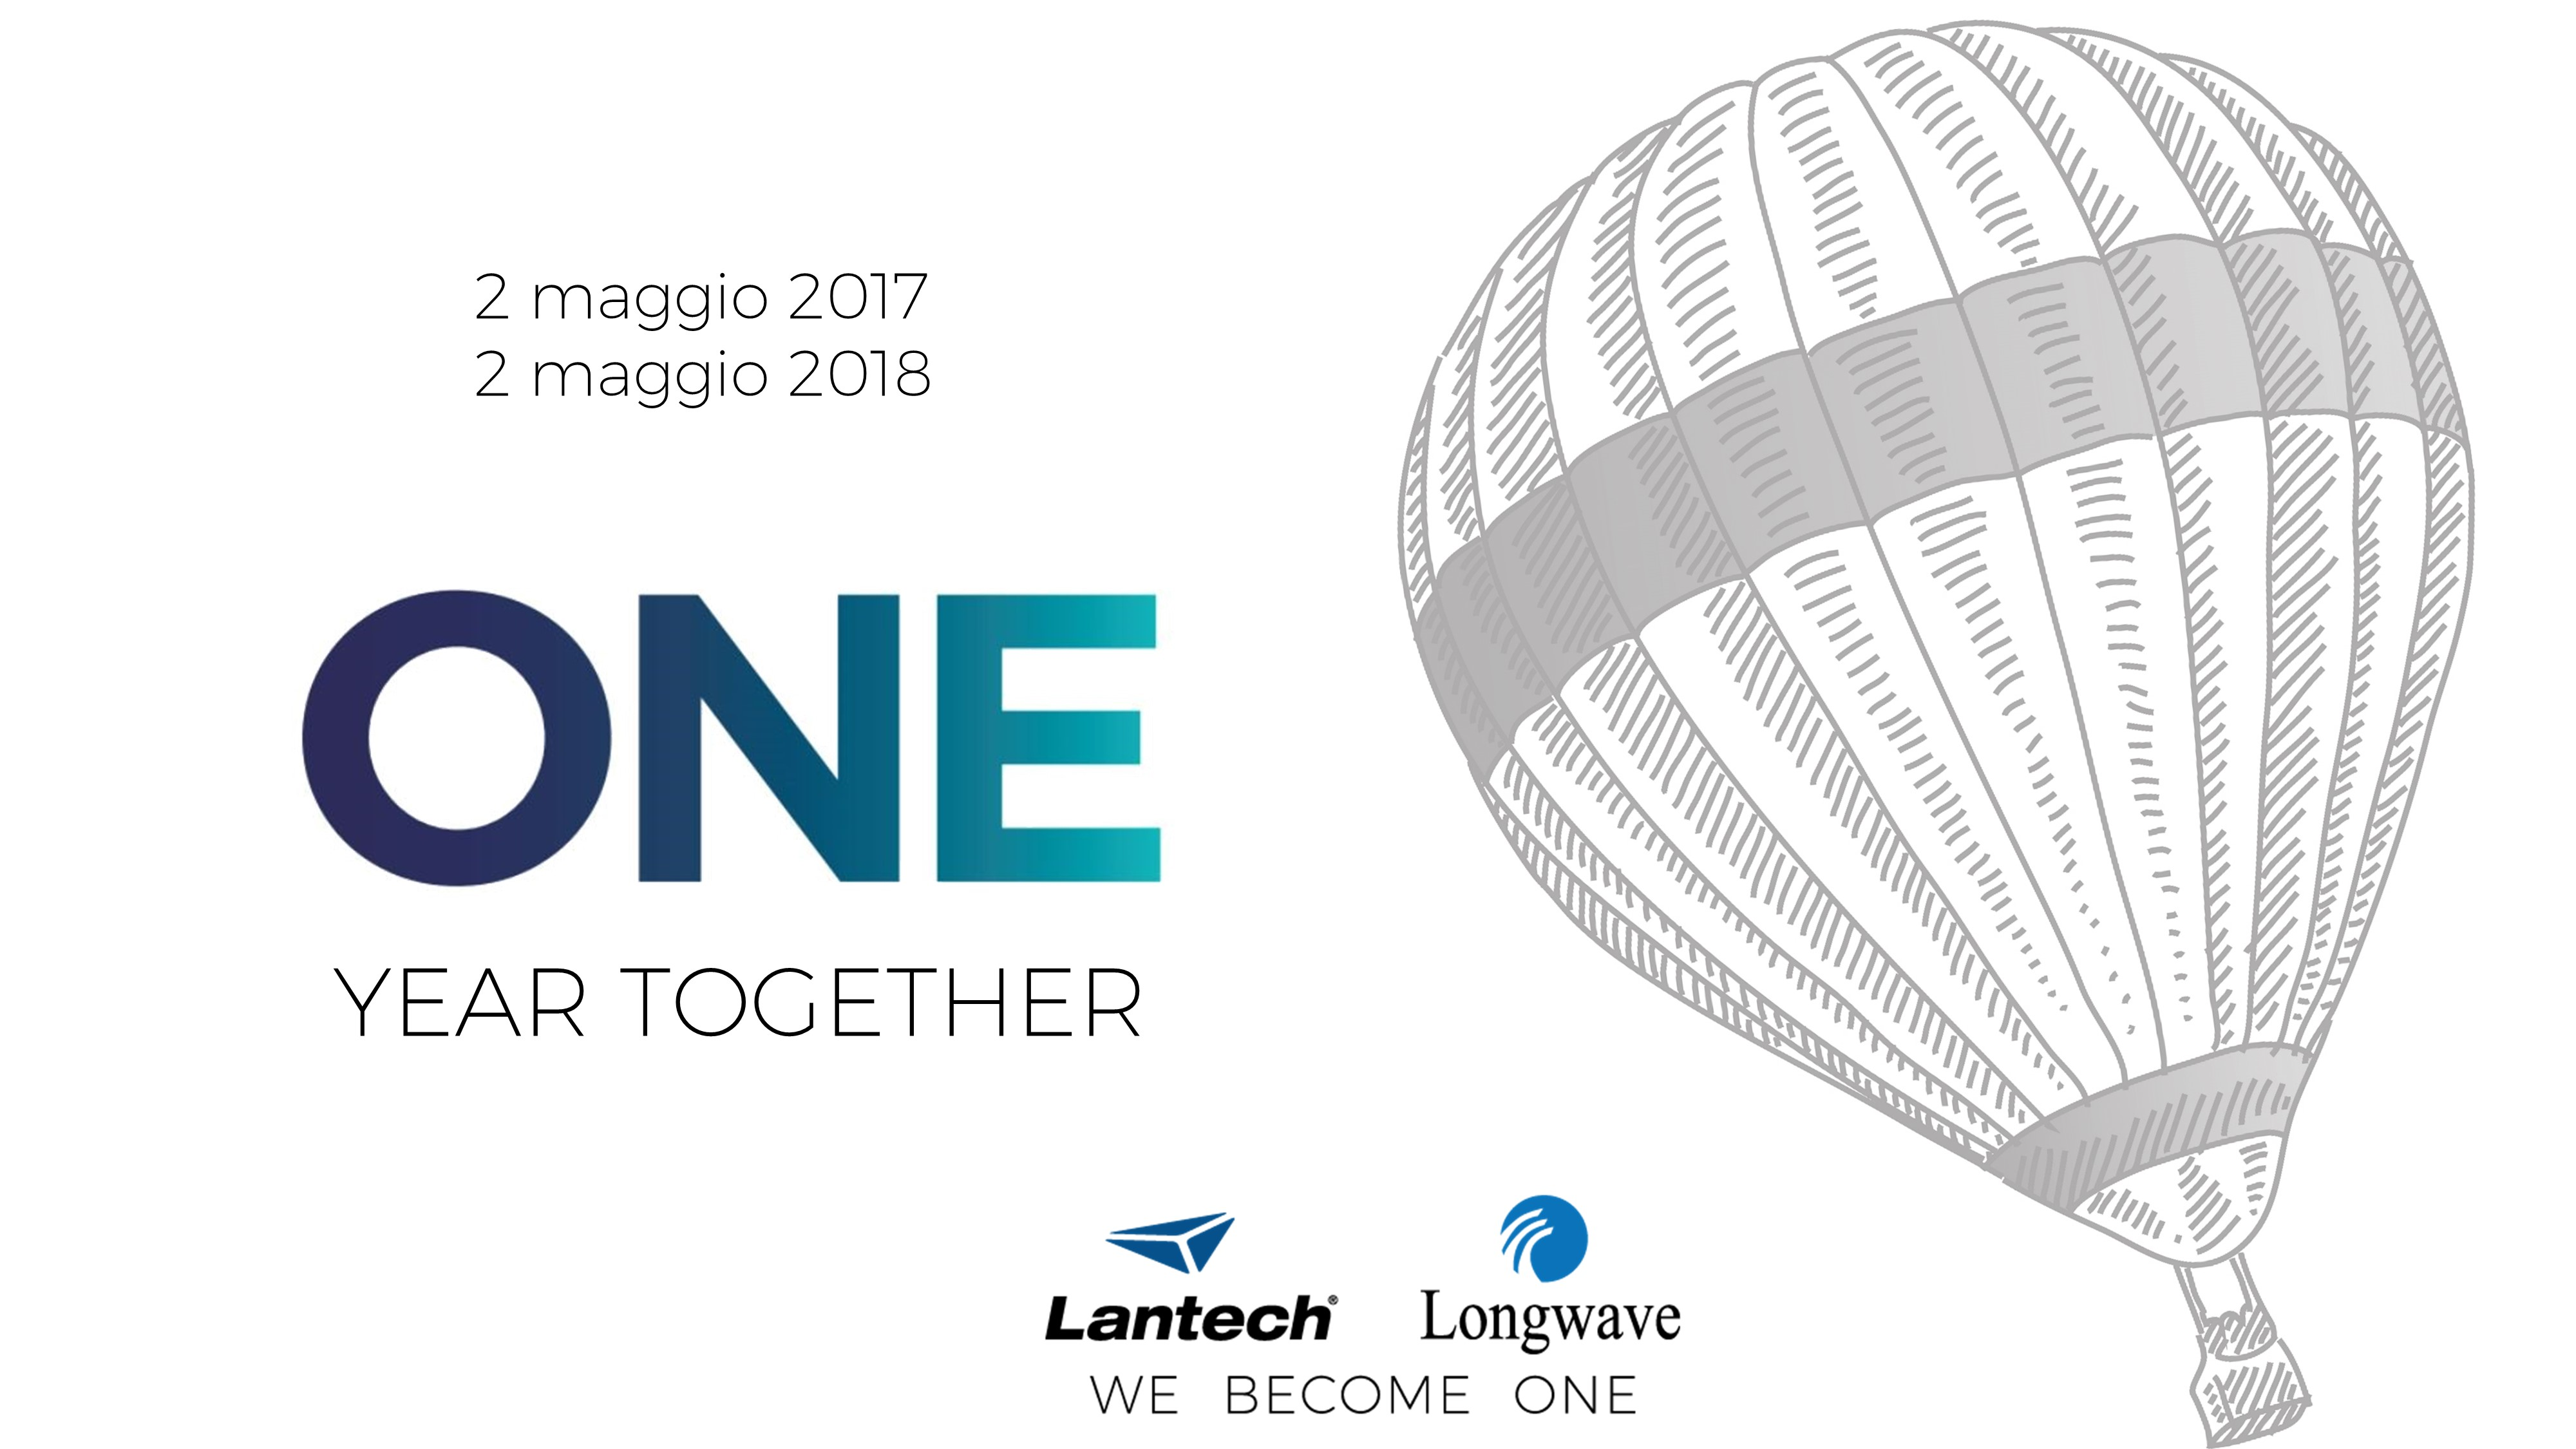 Happy Lantech//Longwave Day!